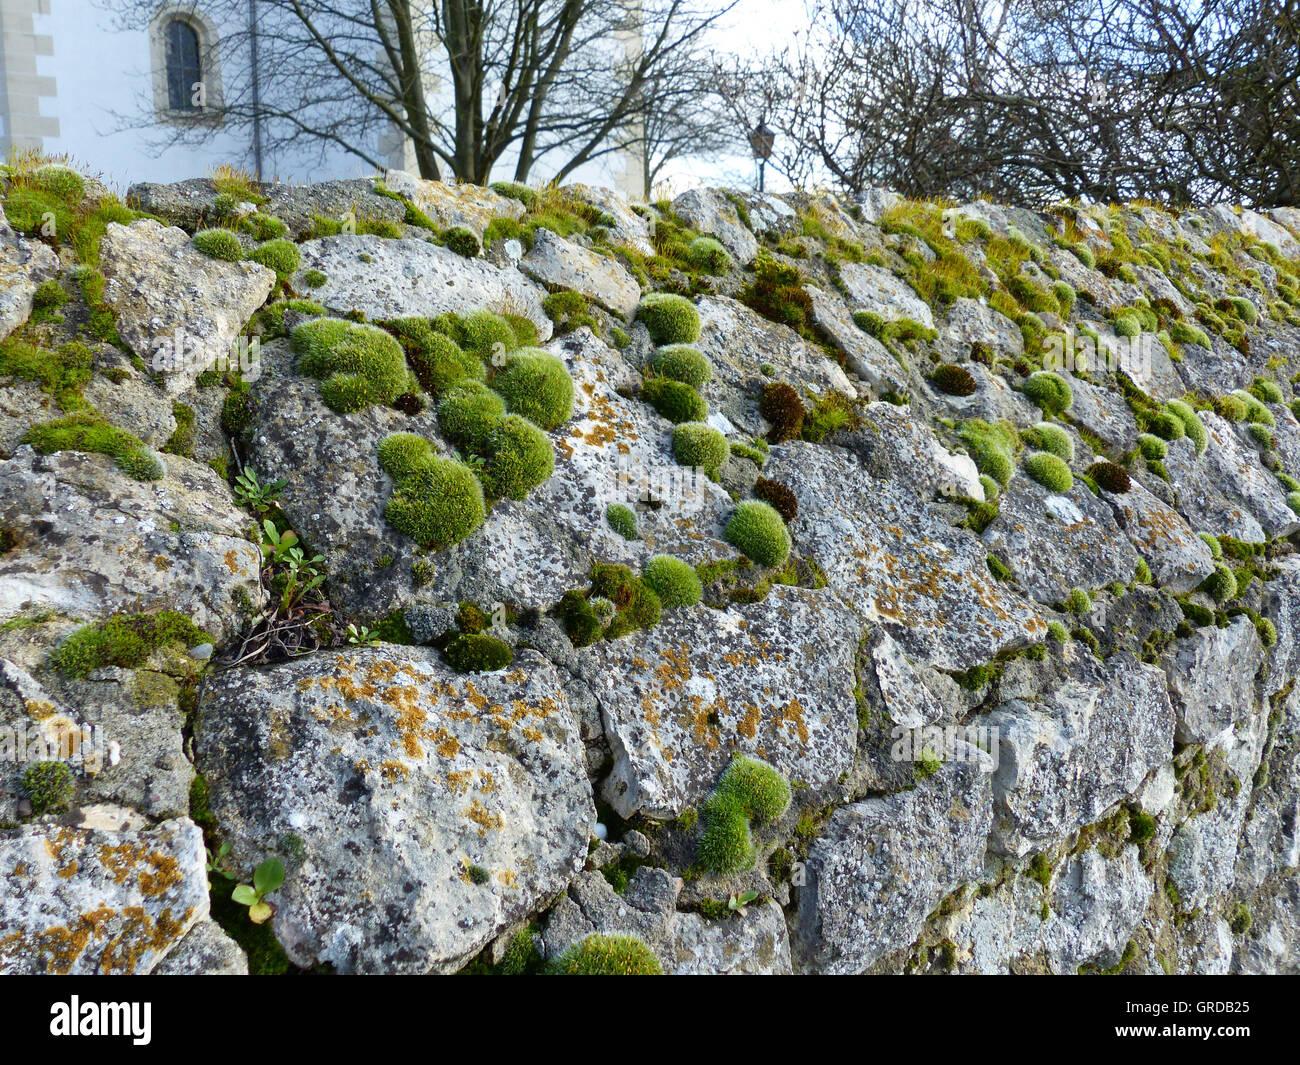 moss wall building stockfotos moss wall building bilder alamy. Black Bedroom Furniture Sets. Home Design Ideas